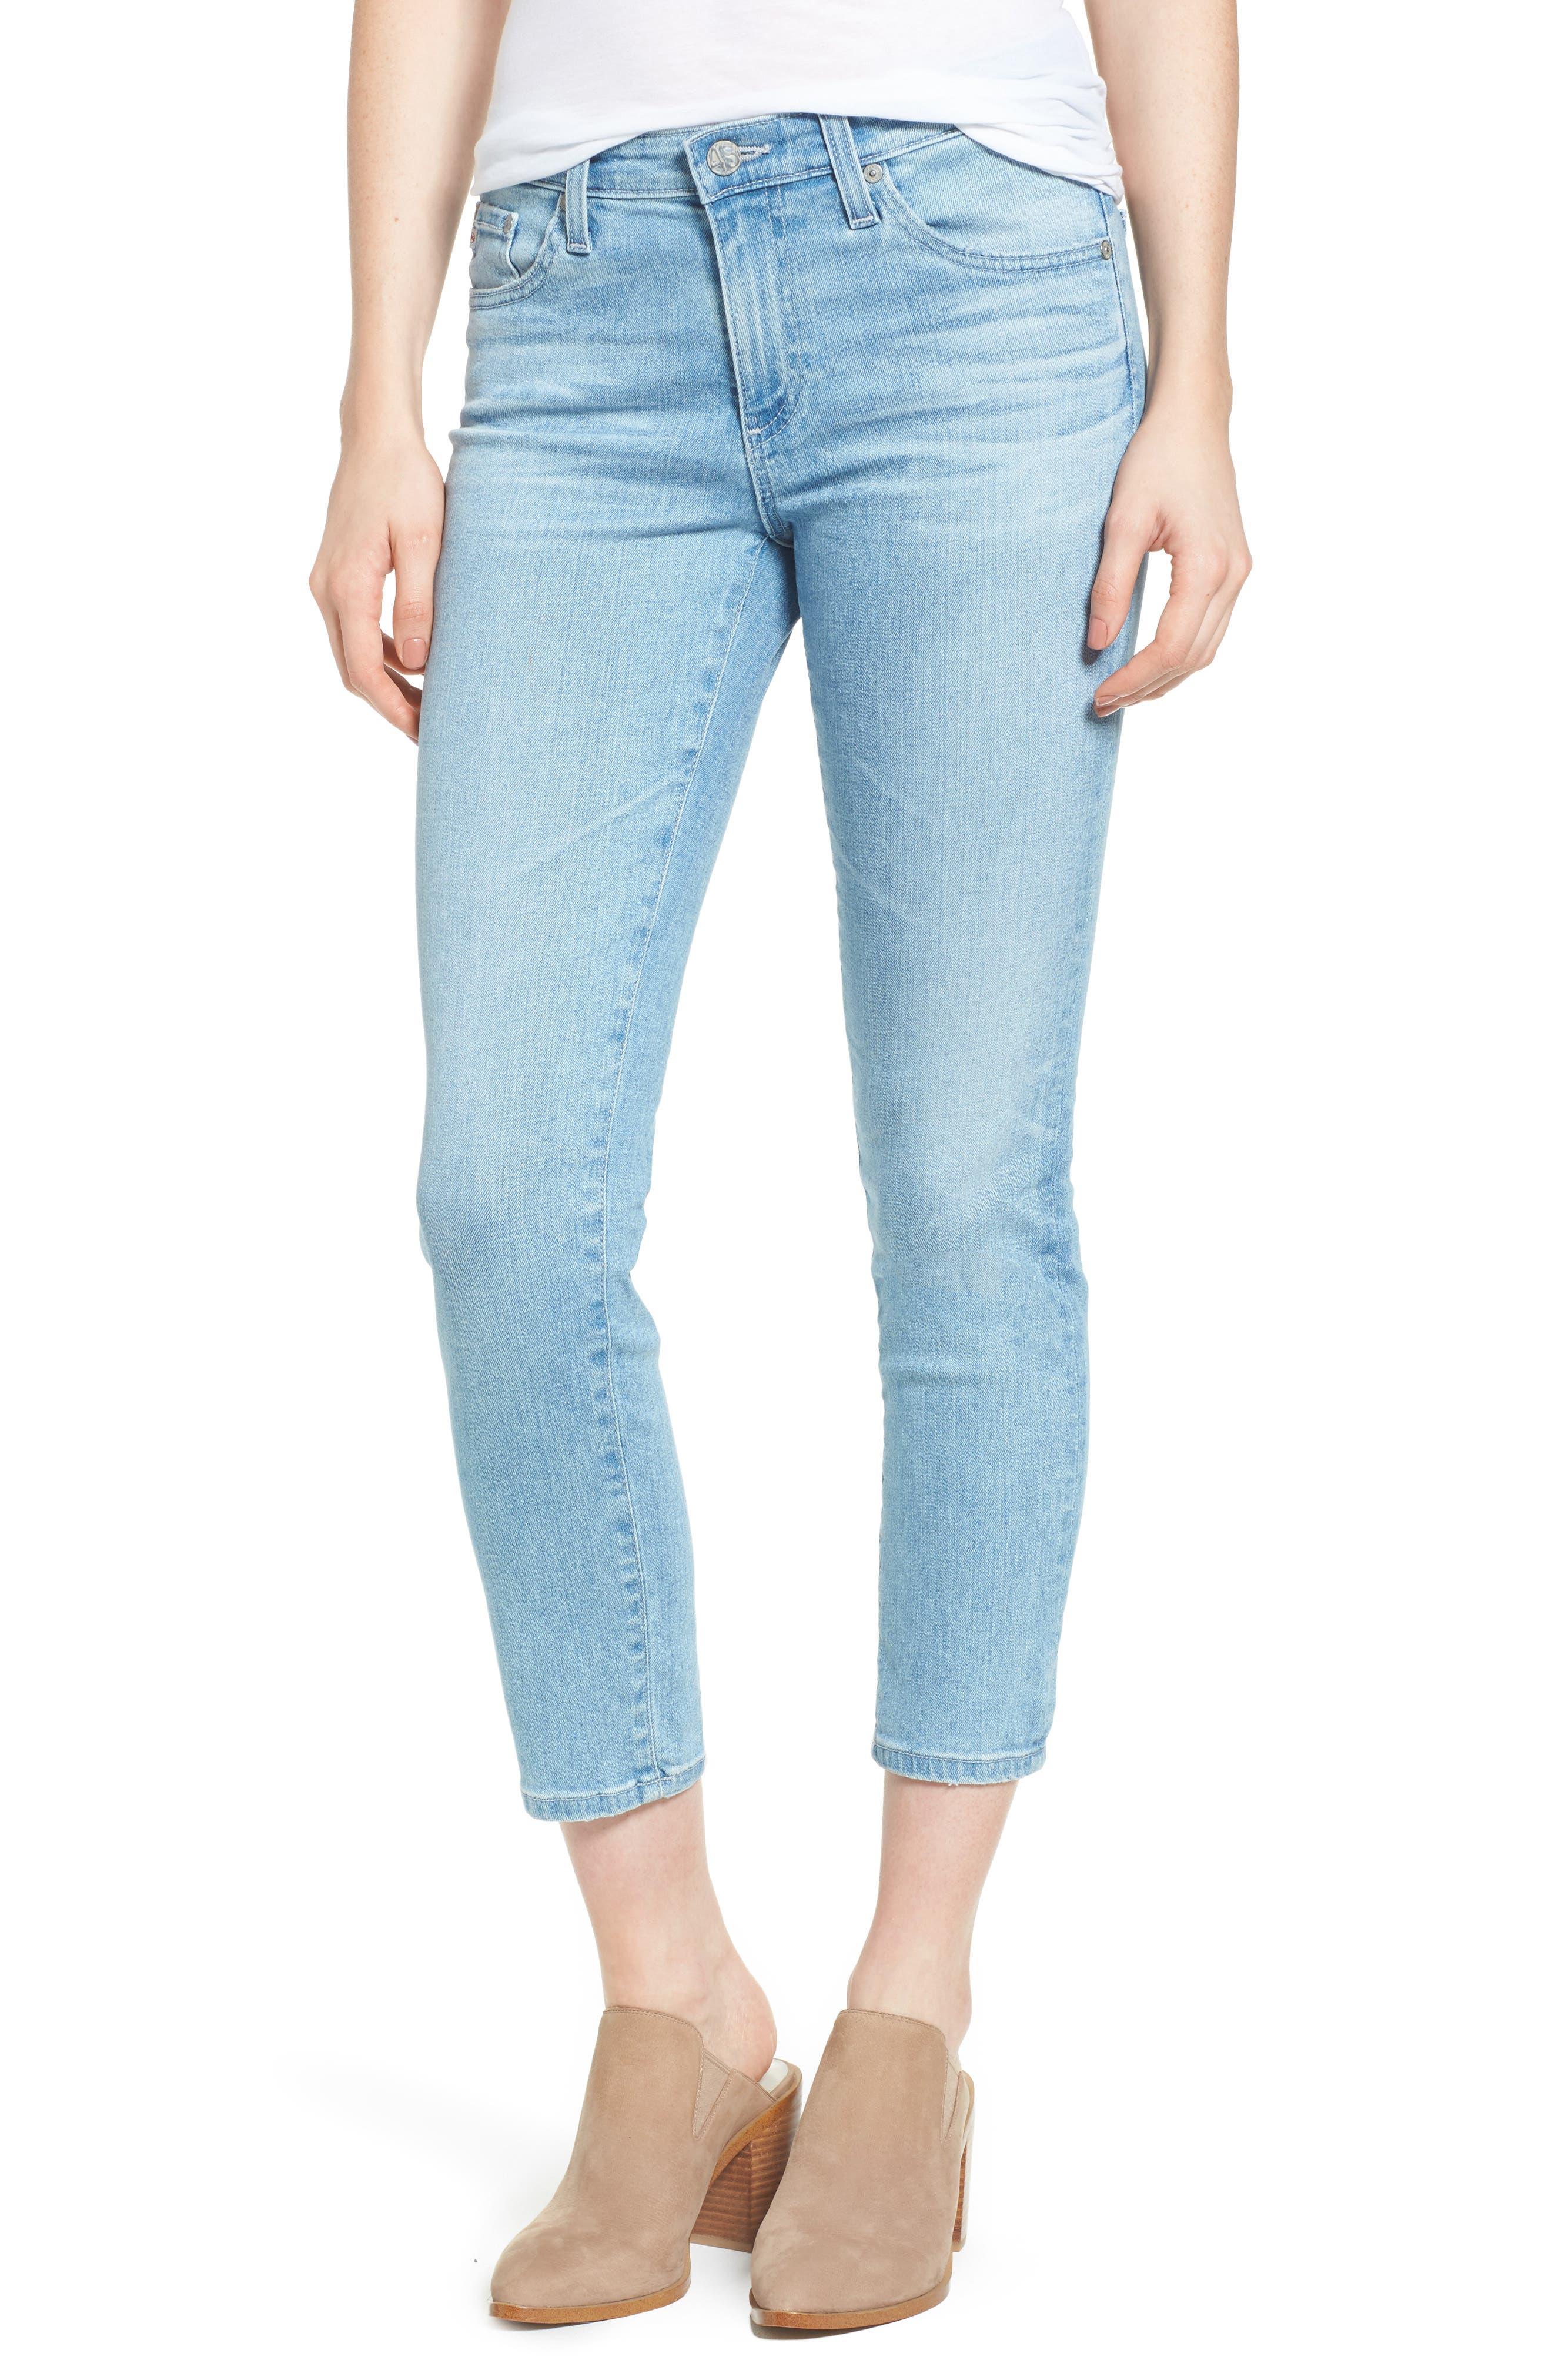 Prima Crop Cigarette Jeans,                         Main,                         color, 20 Years-Oceana